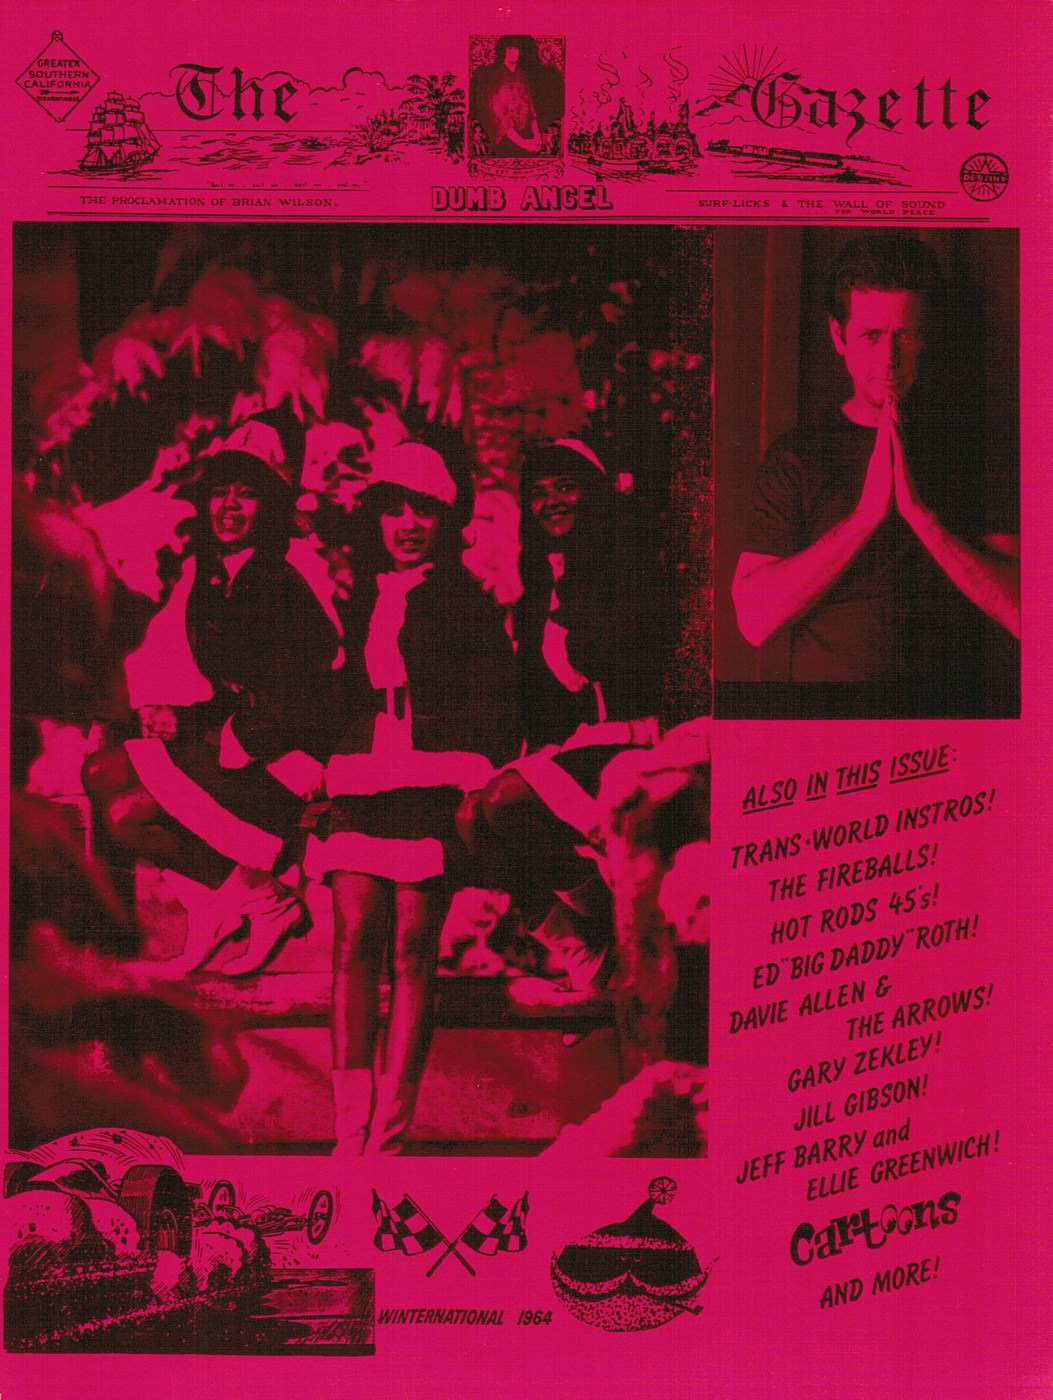 The Dumb Angel Gazette cover